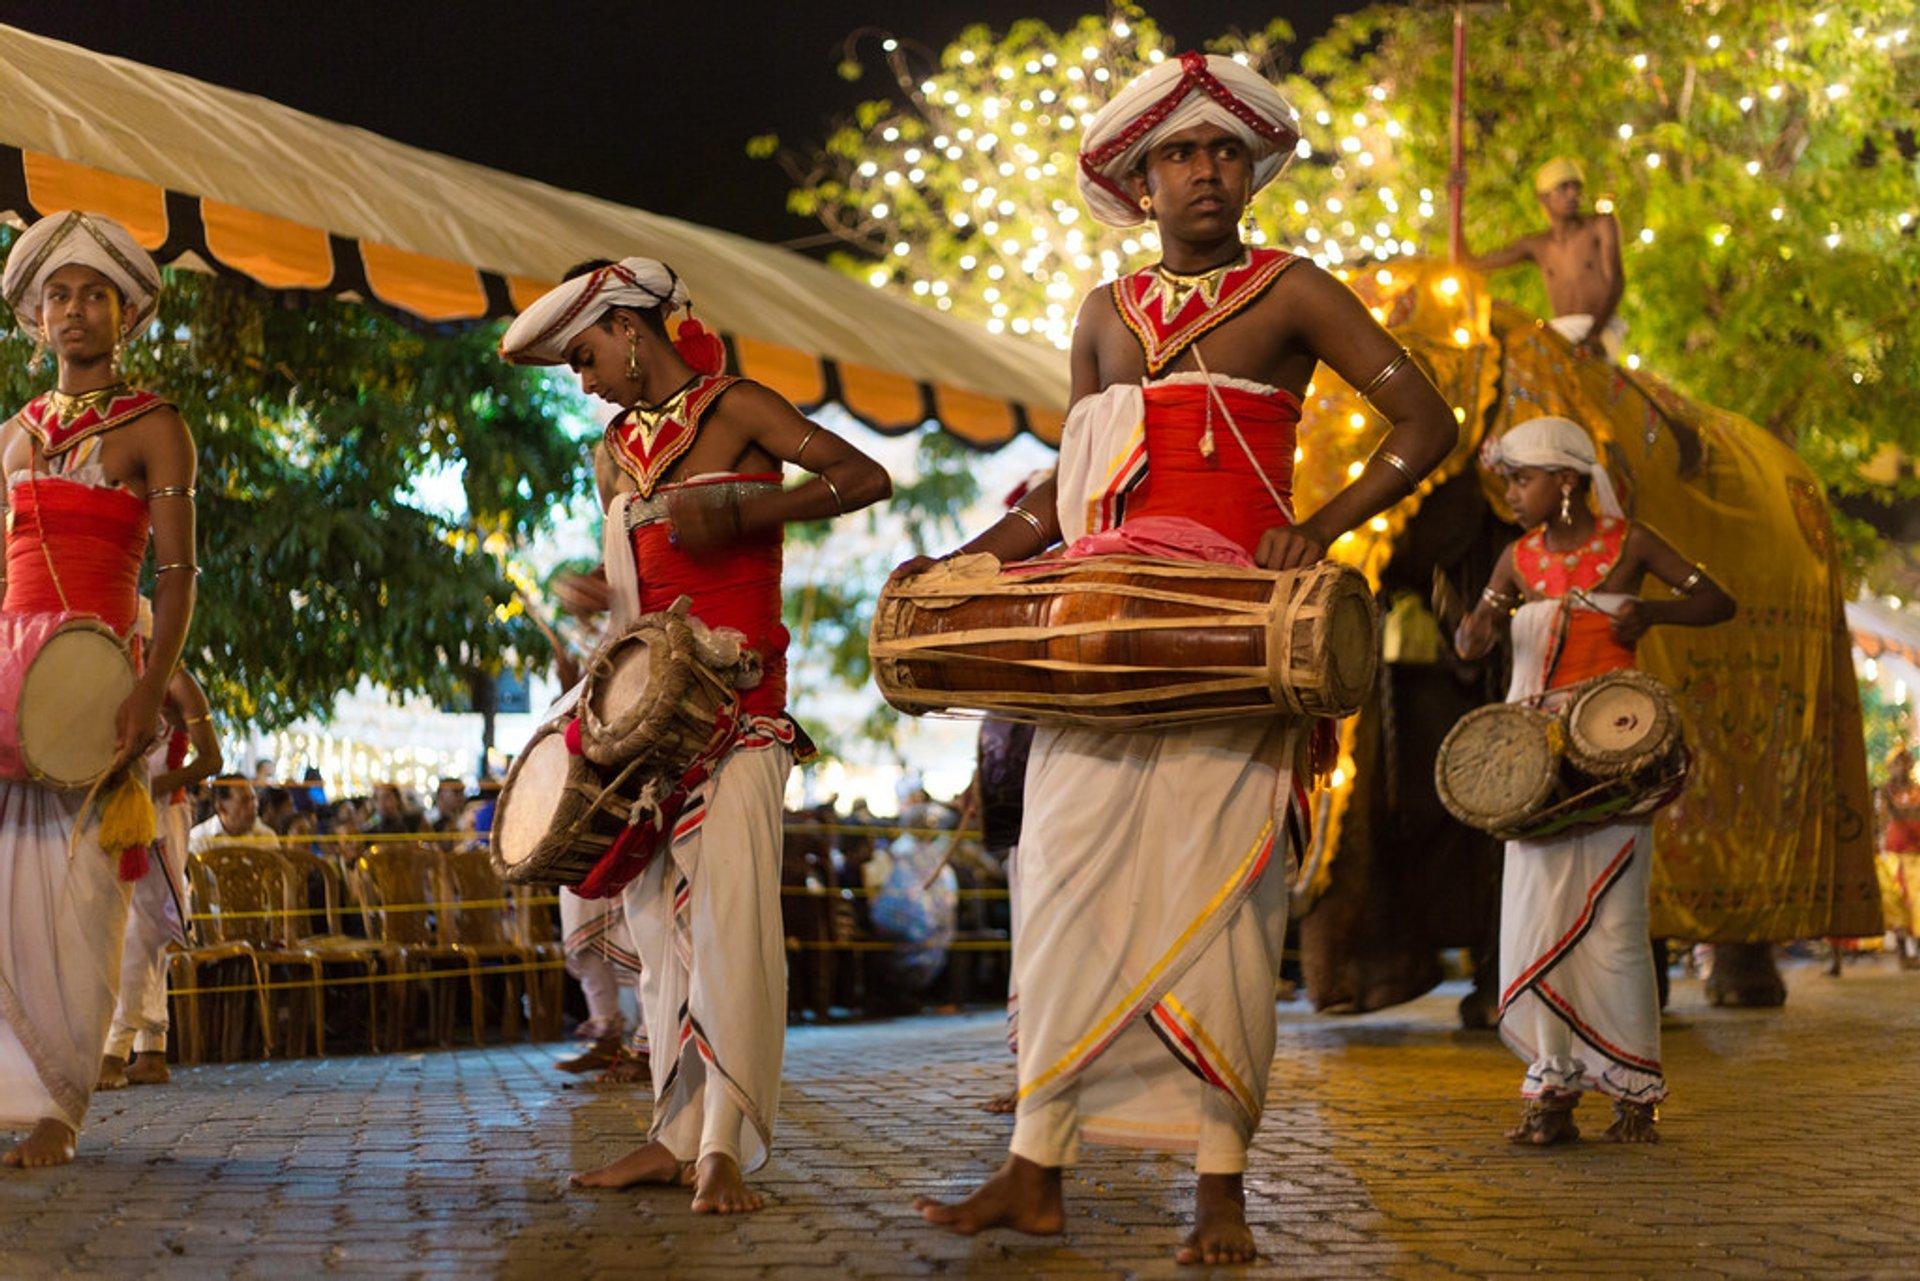 Kandy Esala Perahera in Sri Lanka 2020 - Best Time